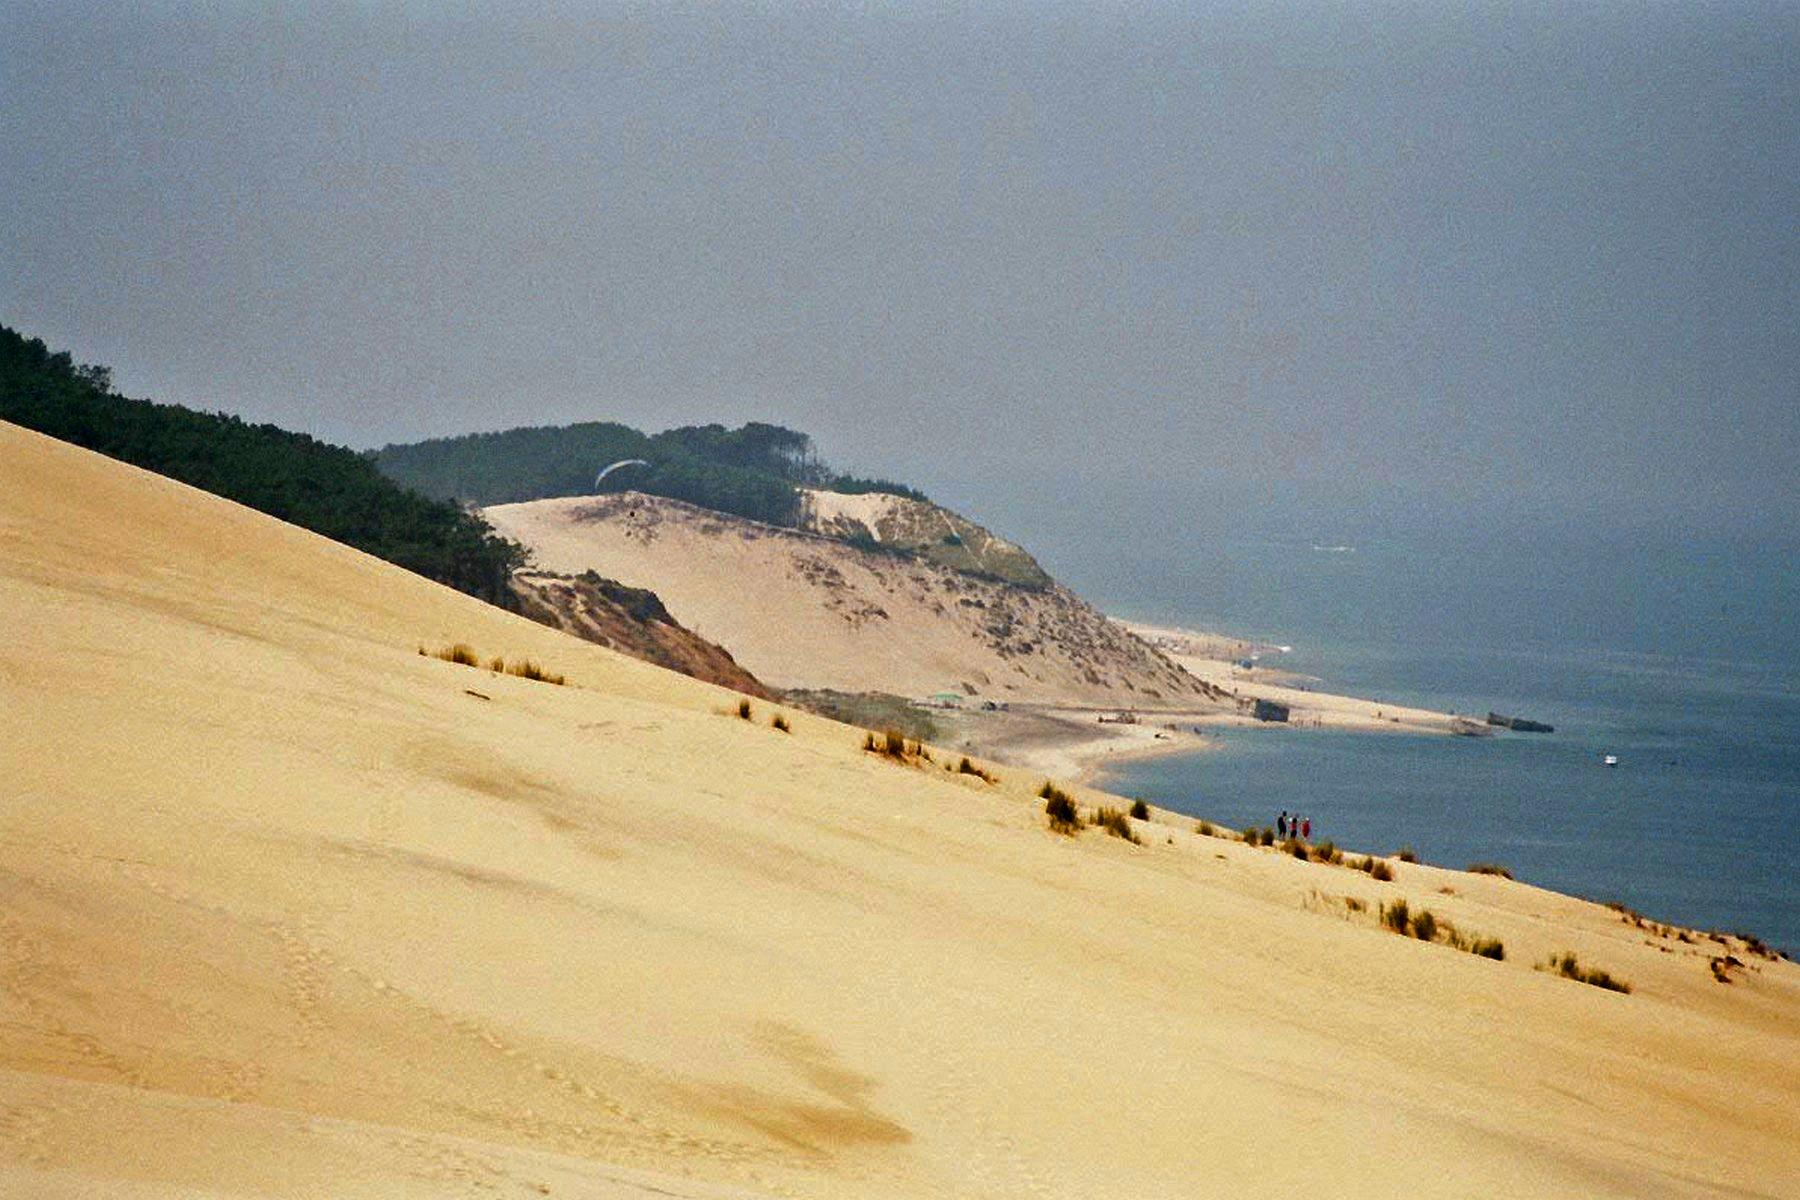 Dune_Pyla02_18-06-2006